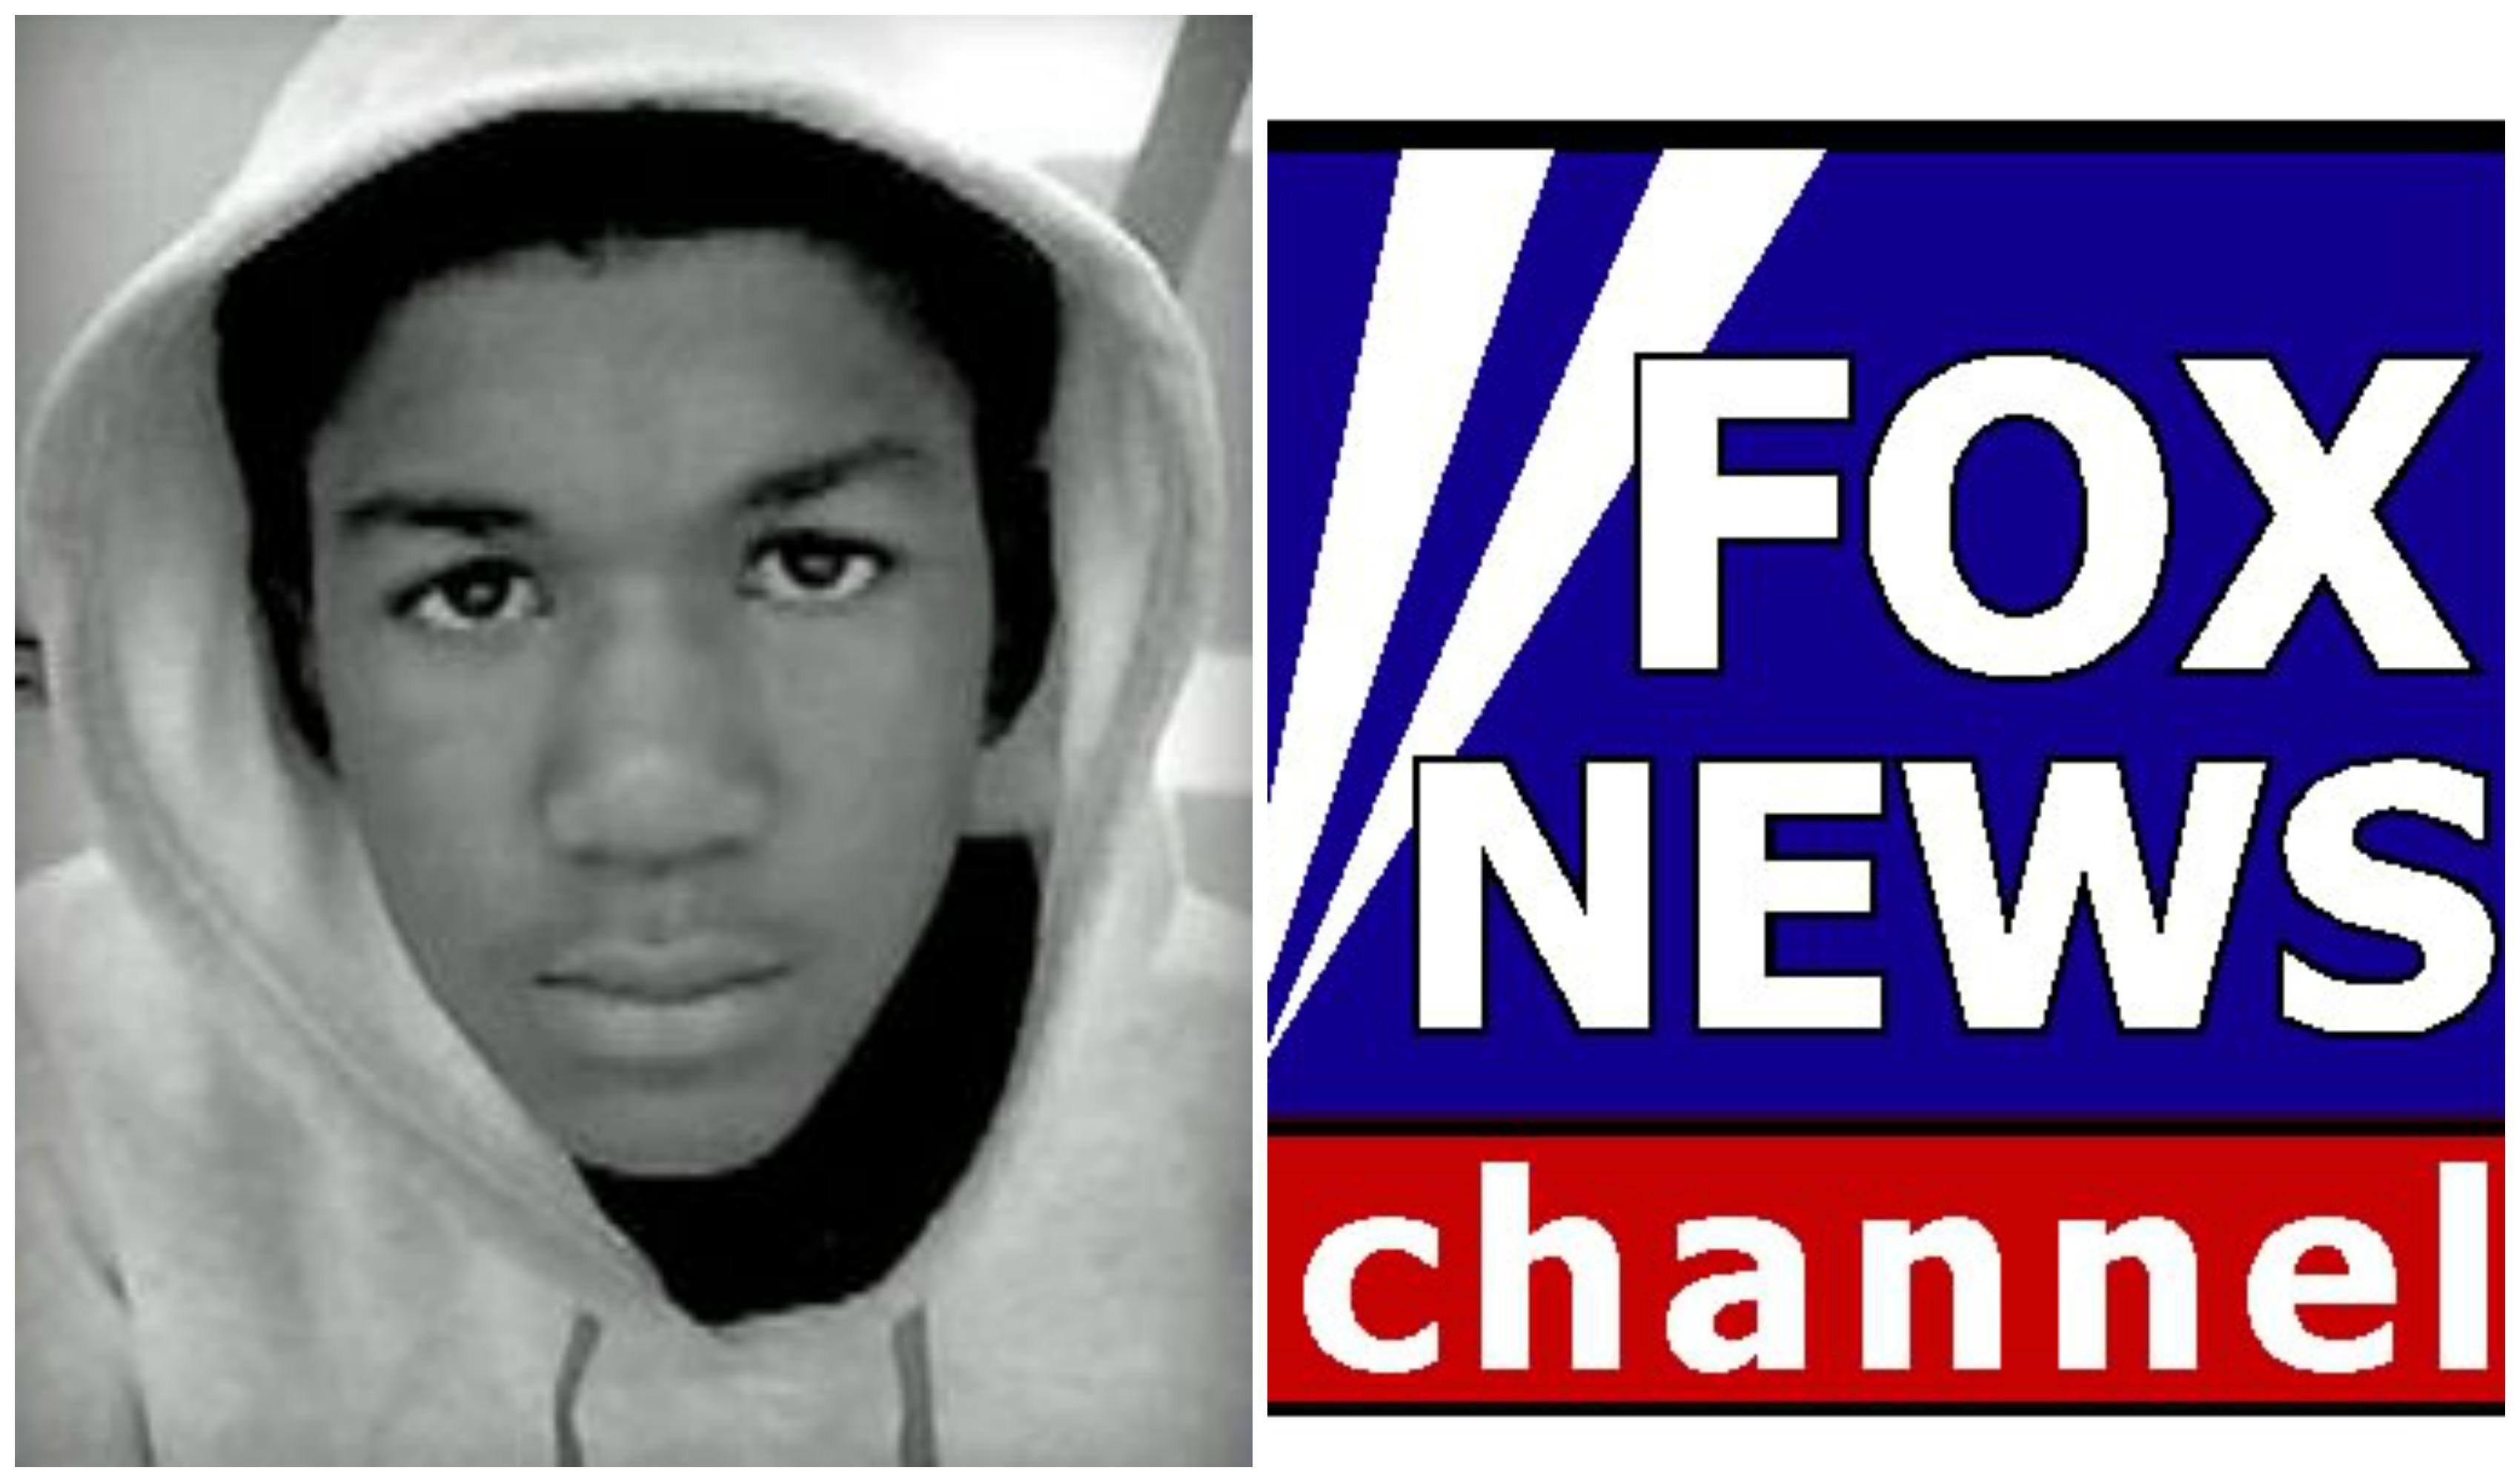 CNN: Zimmerman Prosecutor Excused Potential Black Juror for Being a Fox News Watcher